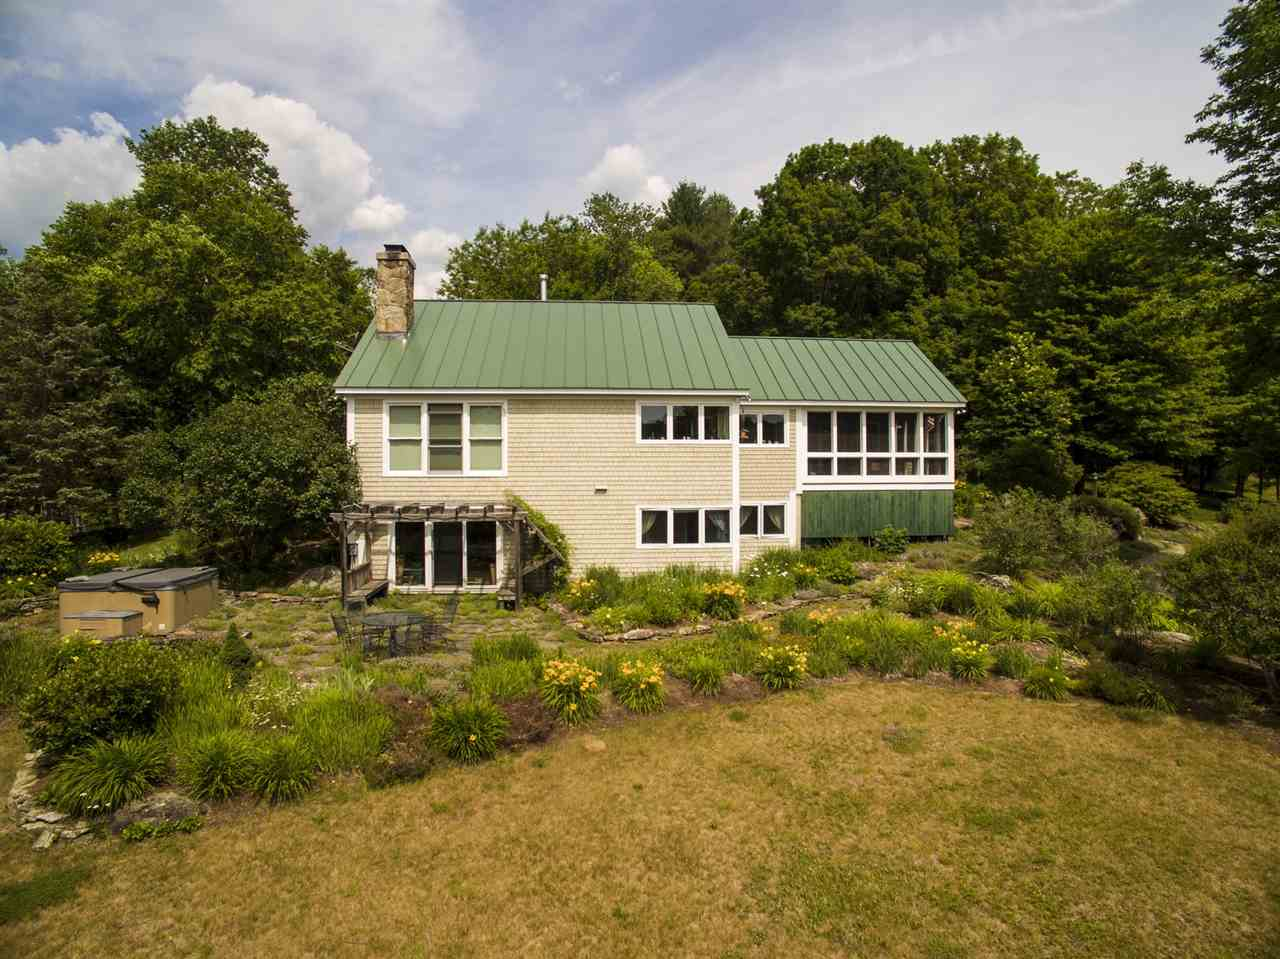 Mount-Snow-Real-Estate-4634813-4